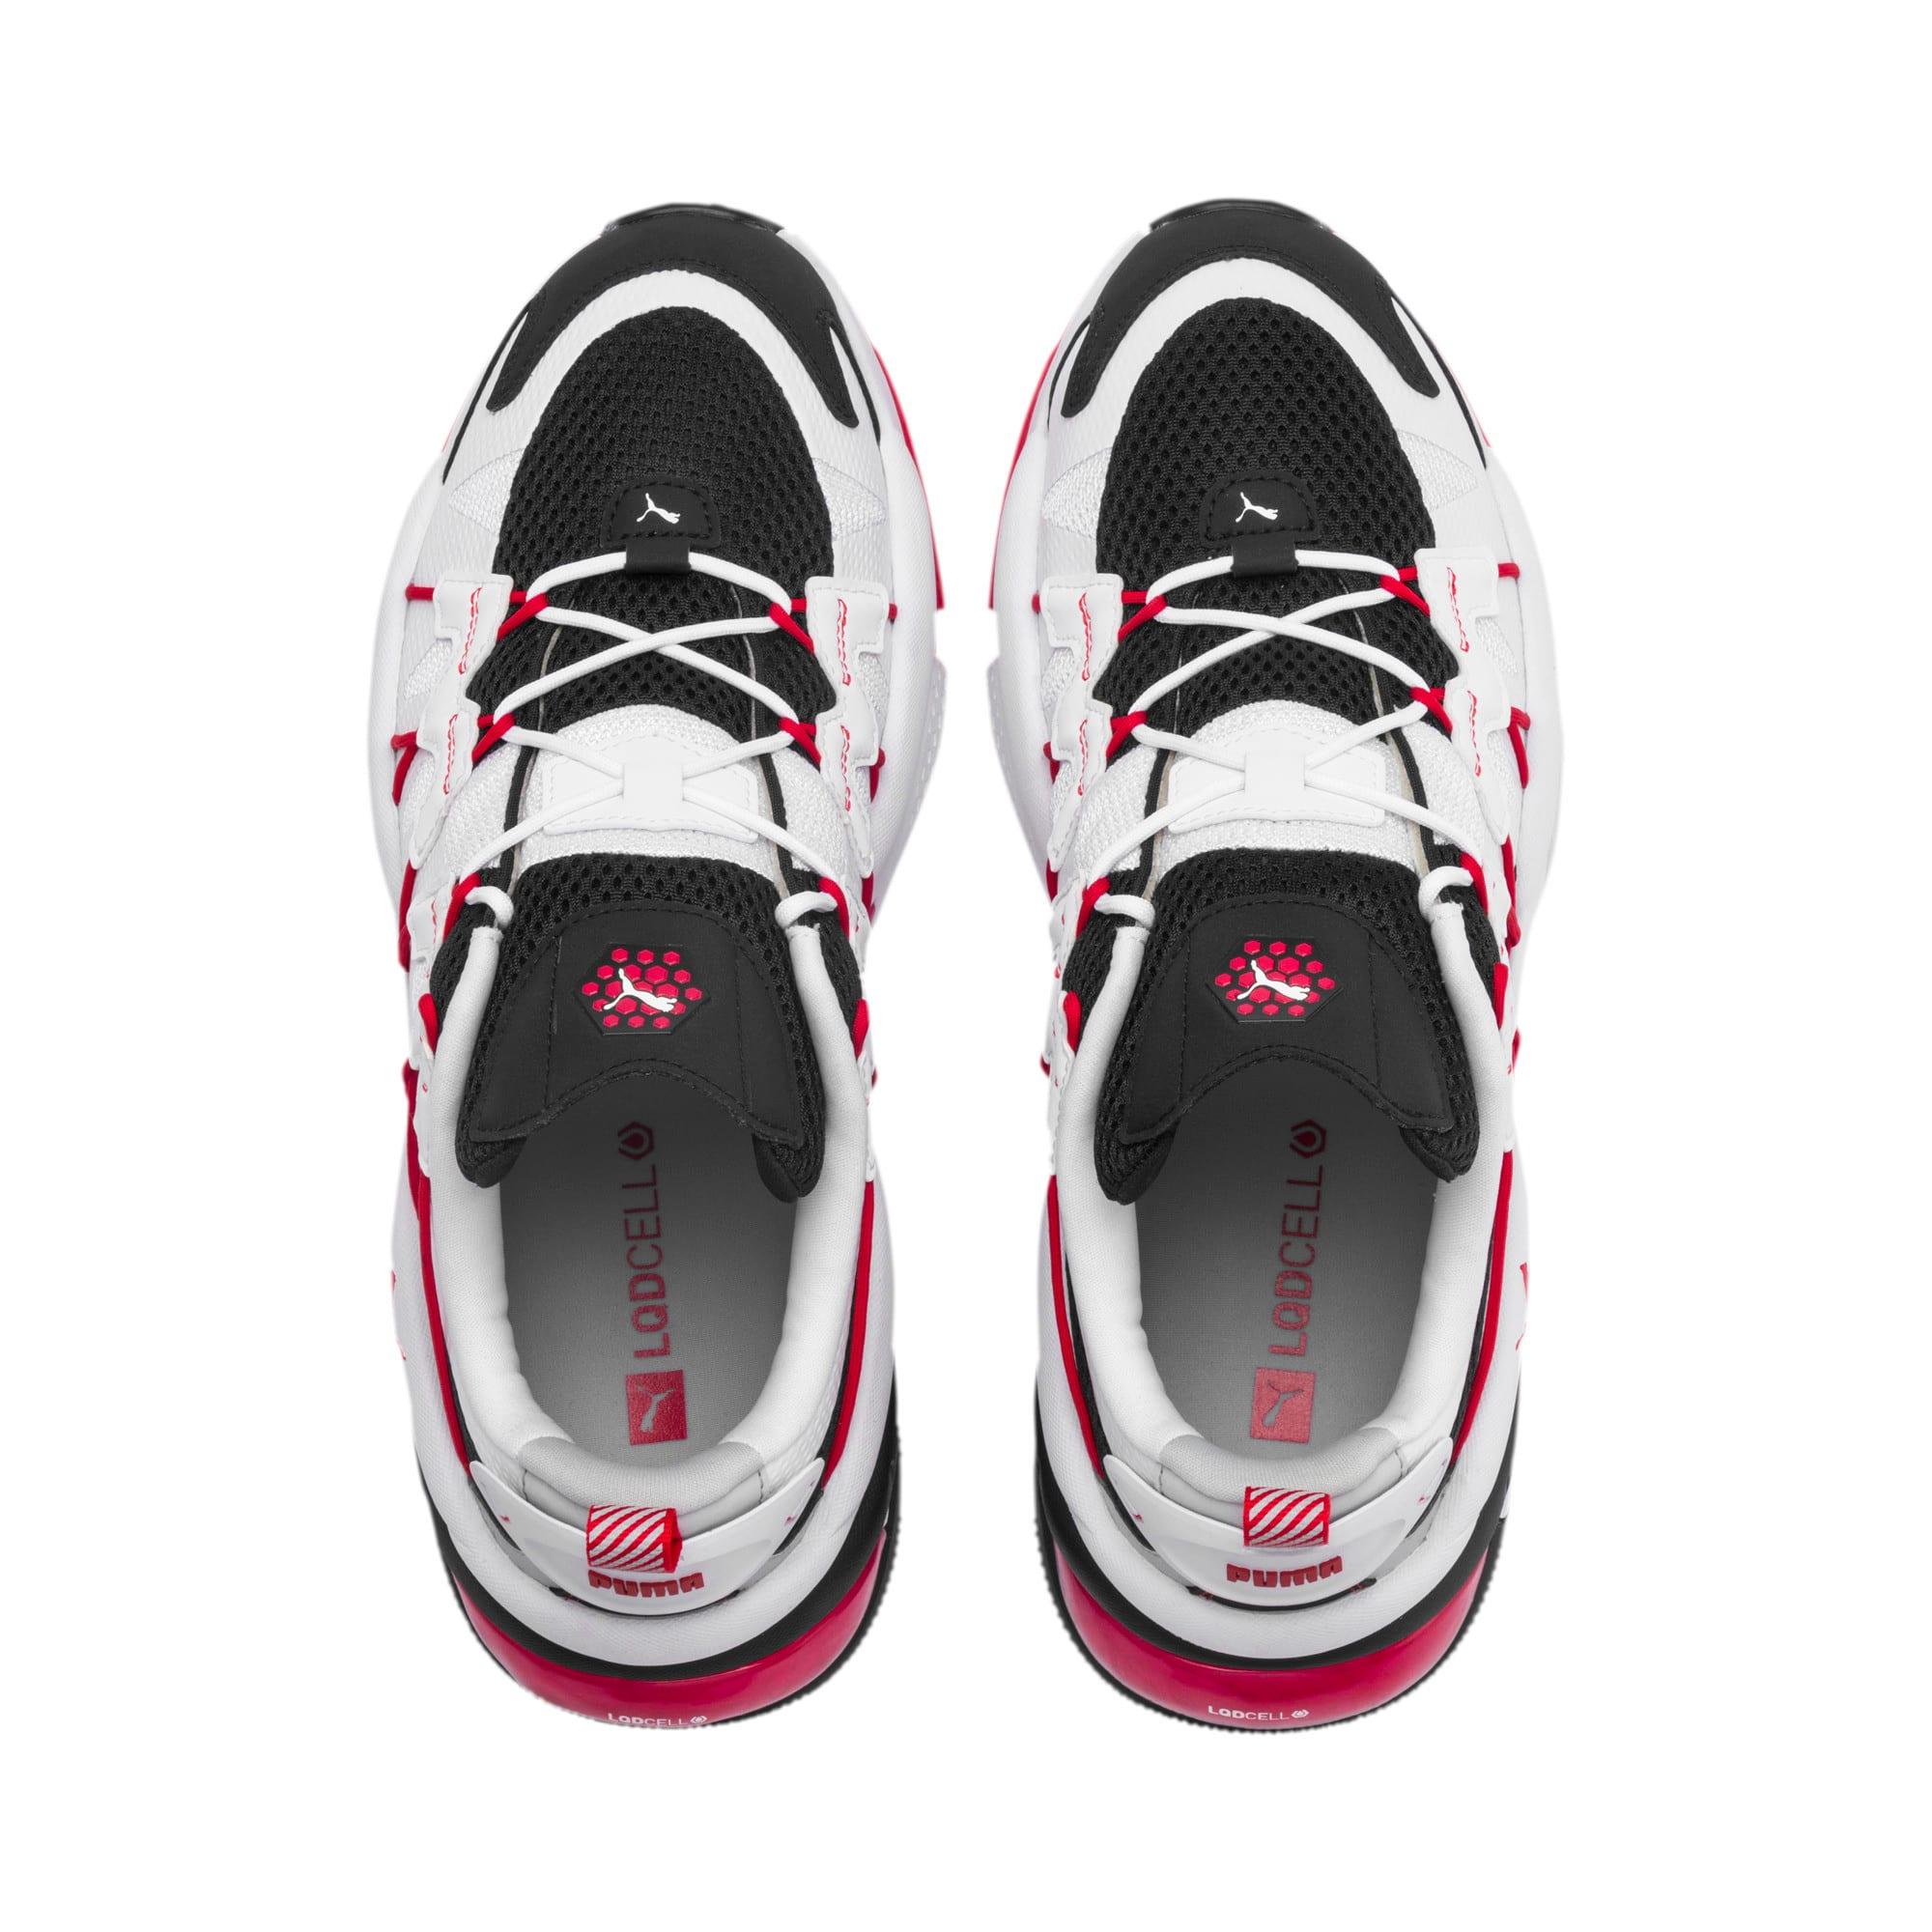 Thumbnail 6 of LQDCELL Omega Sneaker, Puma Black-Puma White, medium